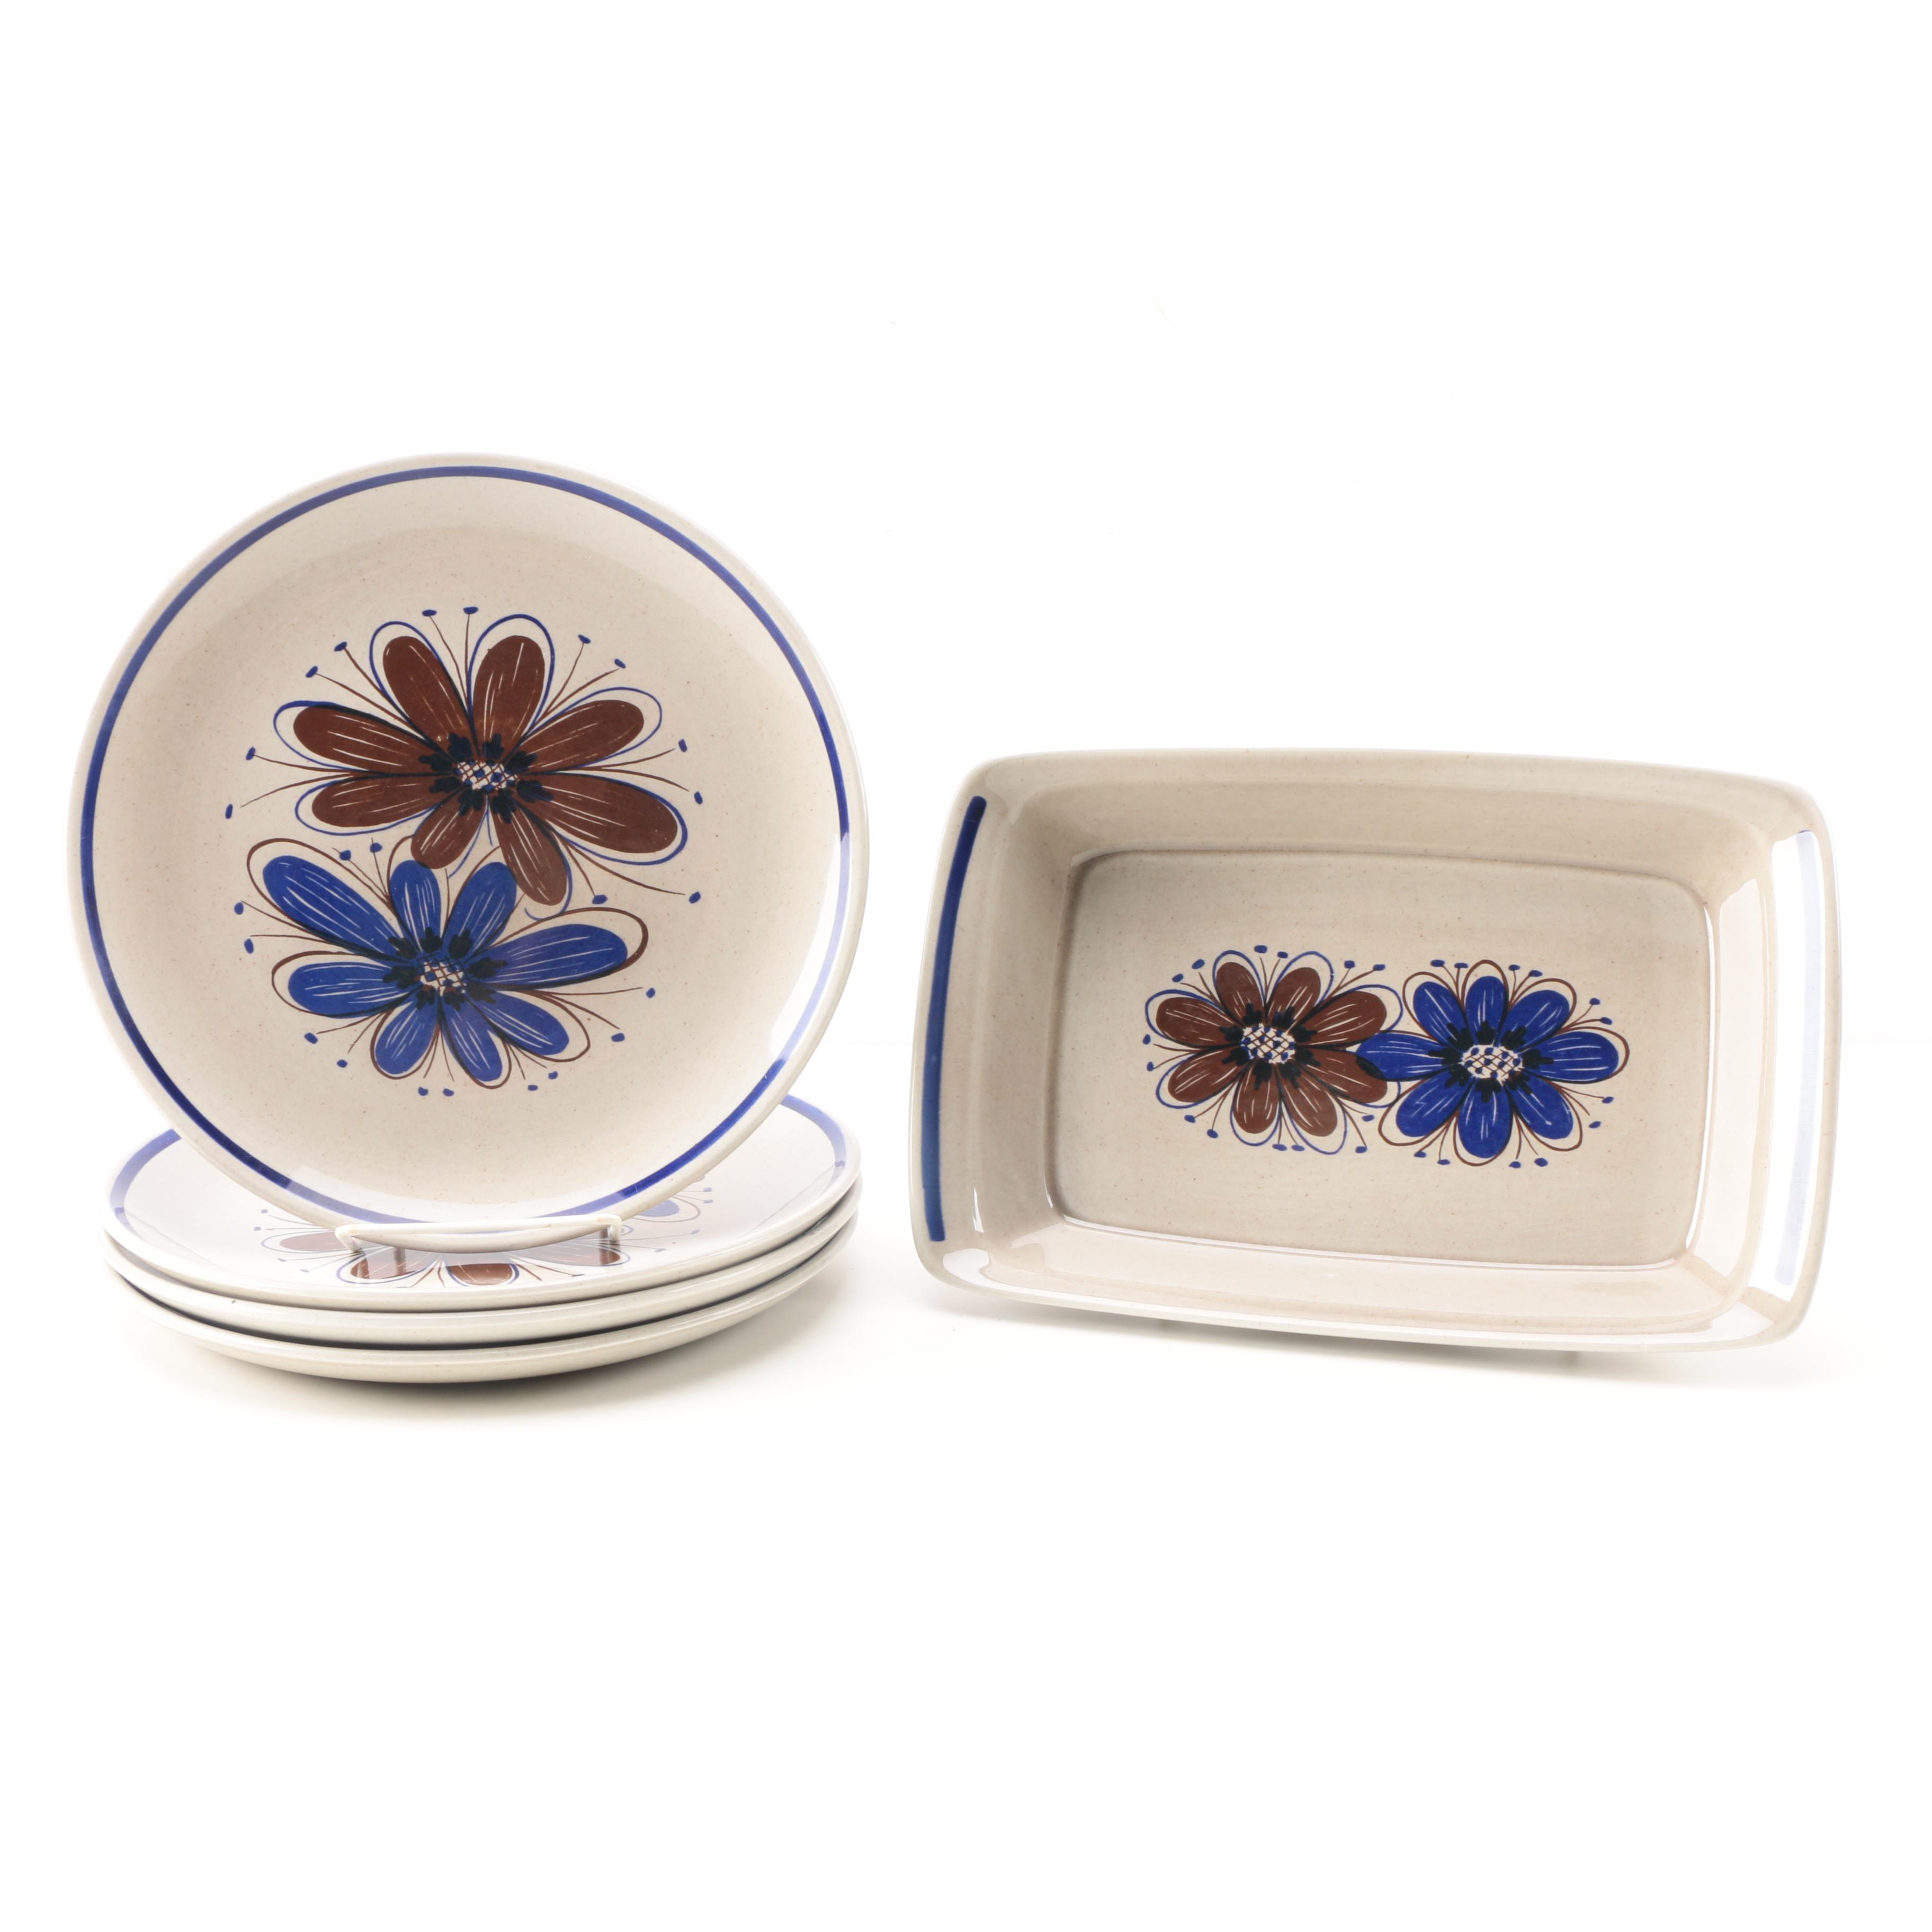 Stavangerflint Ceramic Dinner Plates and Serving Dish